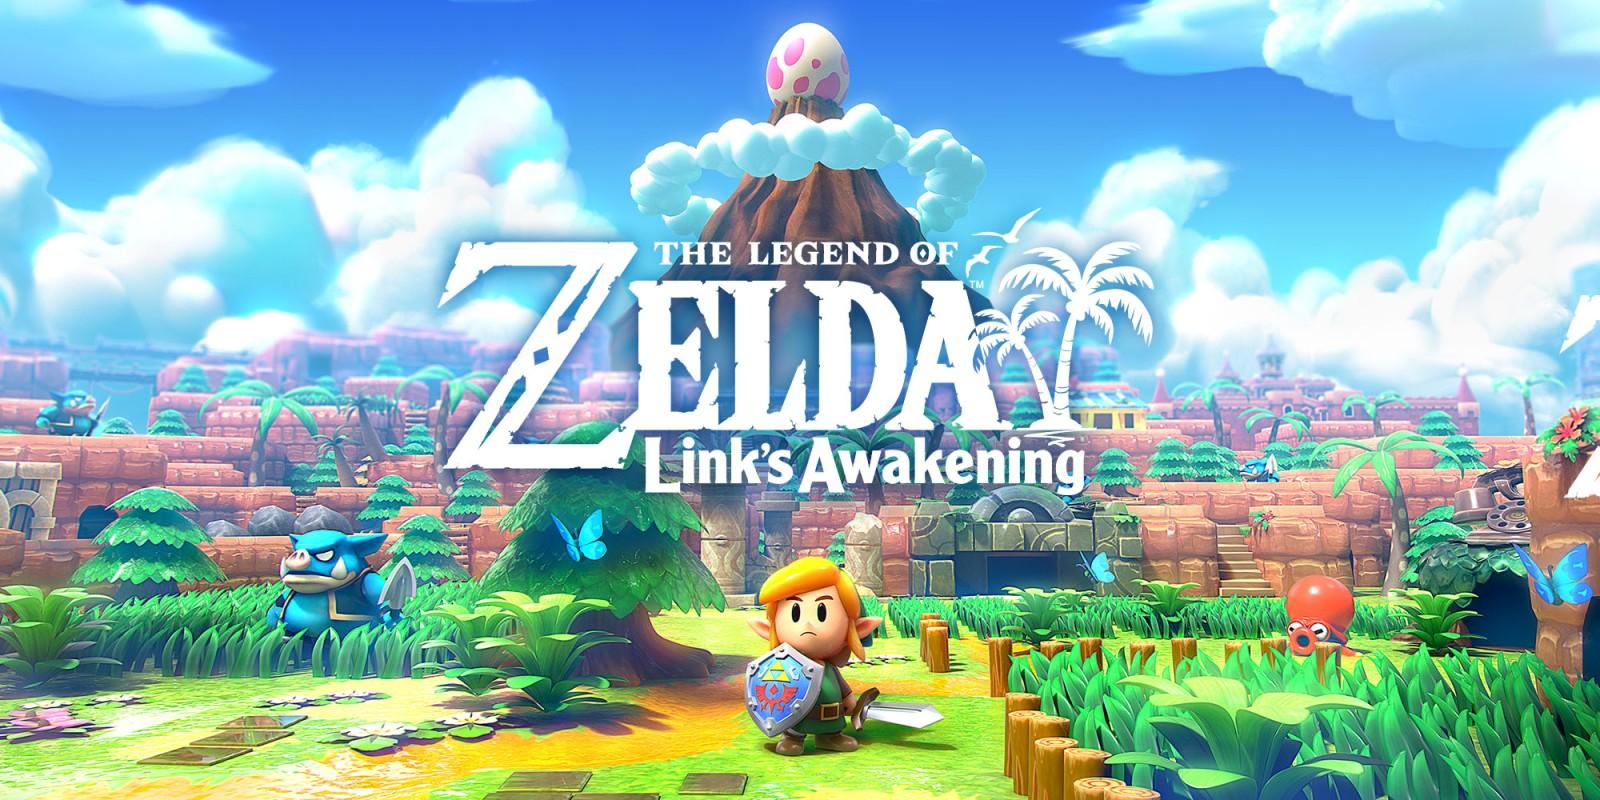 the legend of zelda: link's awakening first review